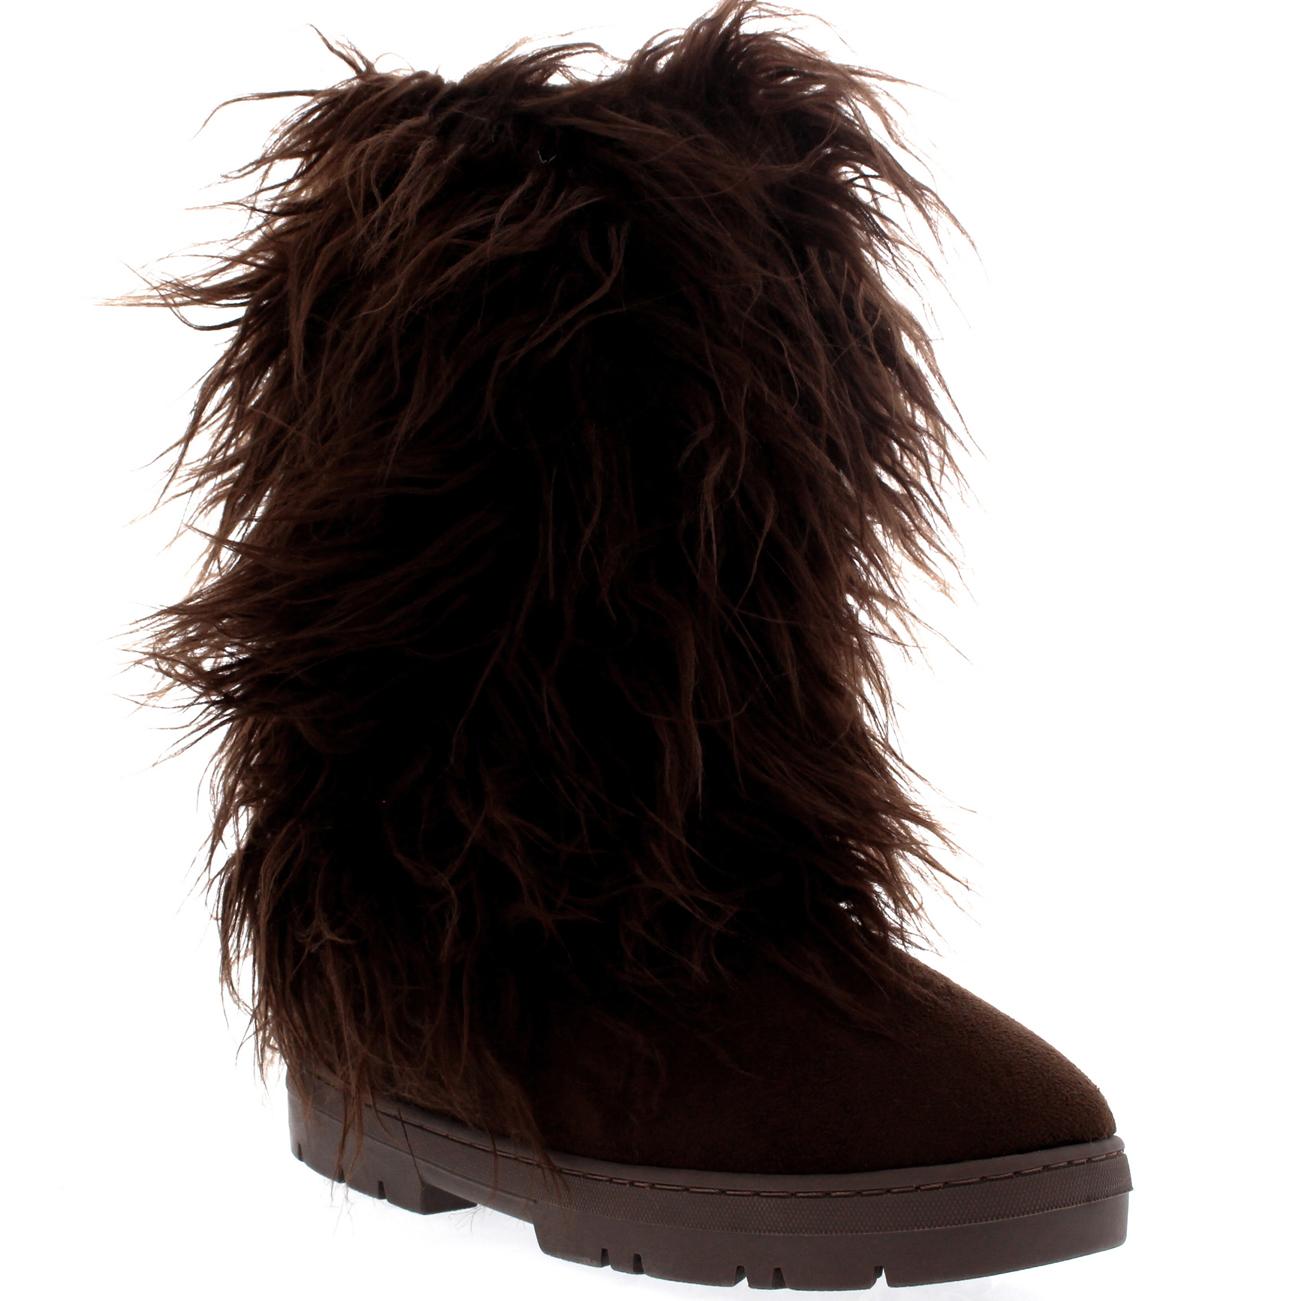 Womens Long Fur Covered Rain Fur Lined Winter Warm Tall Snow Boots ...